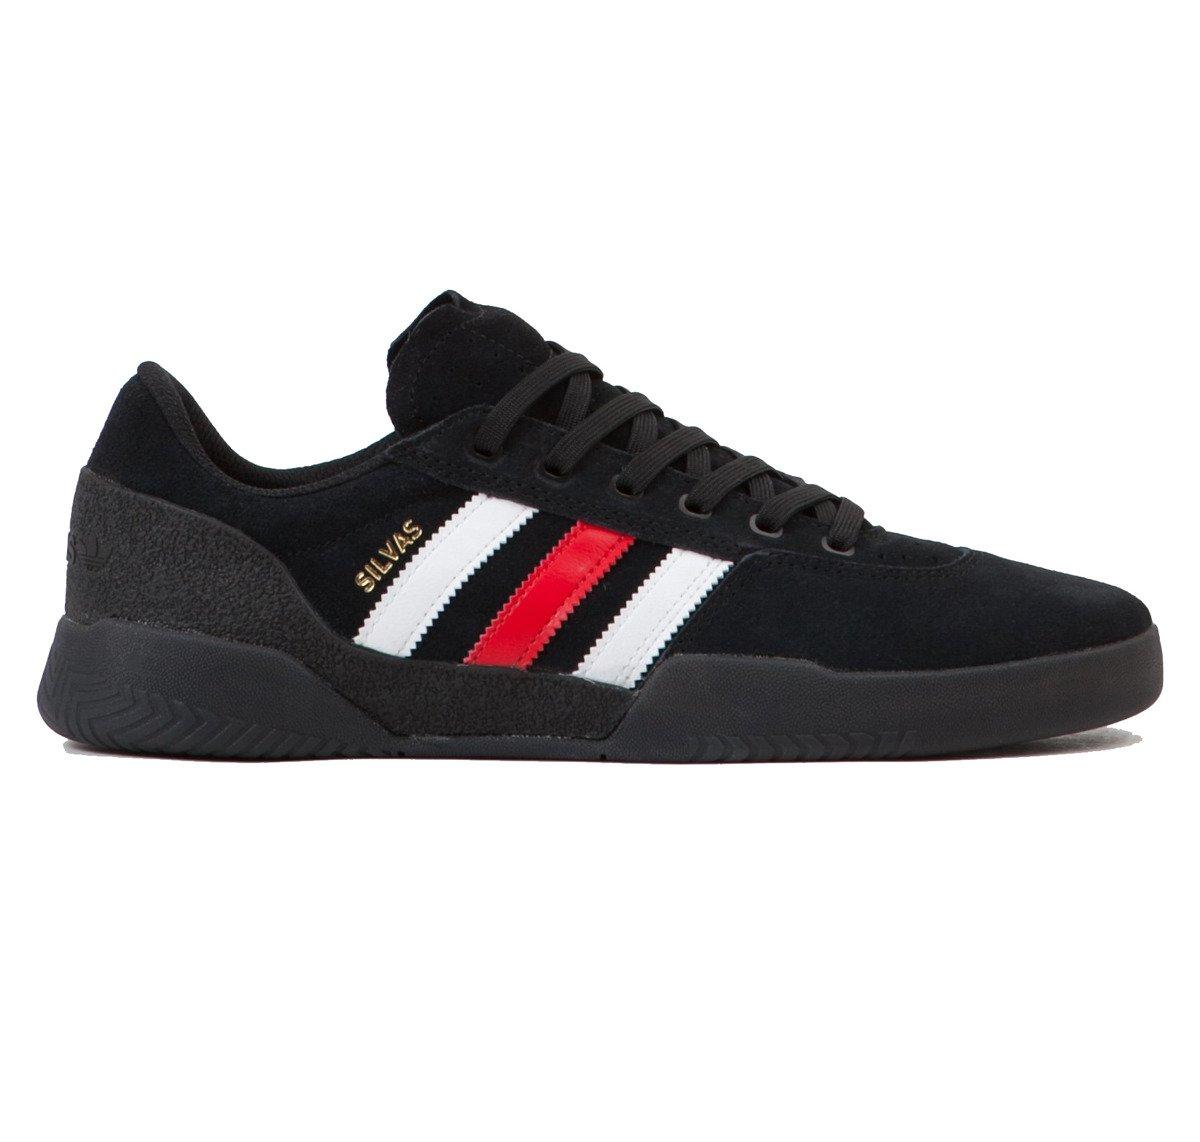 69ee67fdf4453 shoes adidas skateboarding city cup black scarlet ftwwht